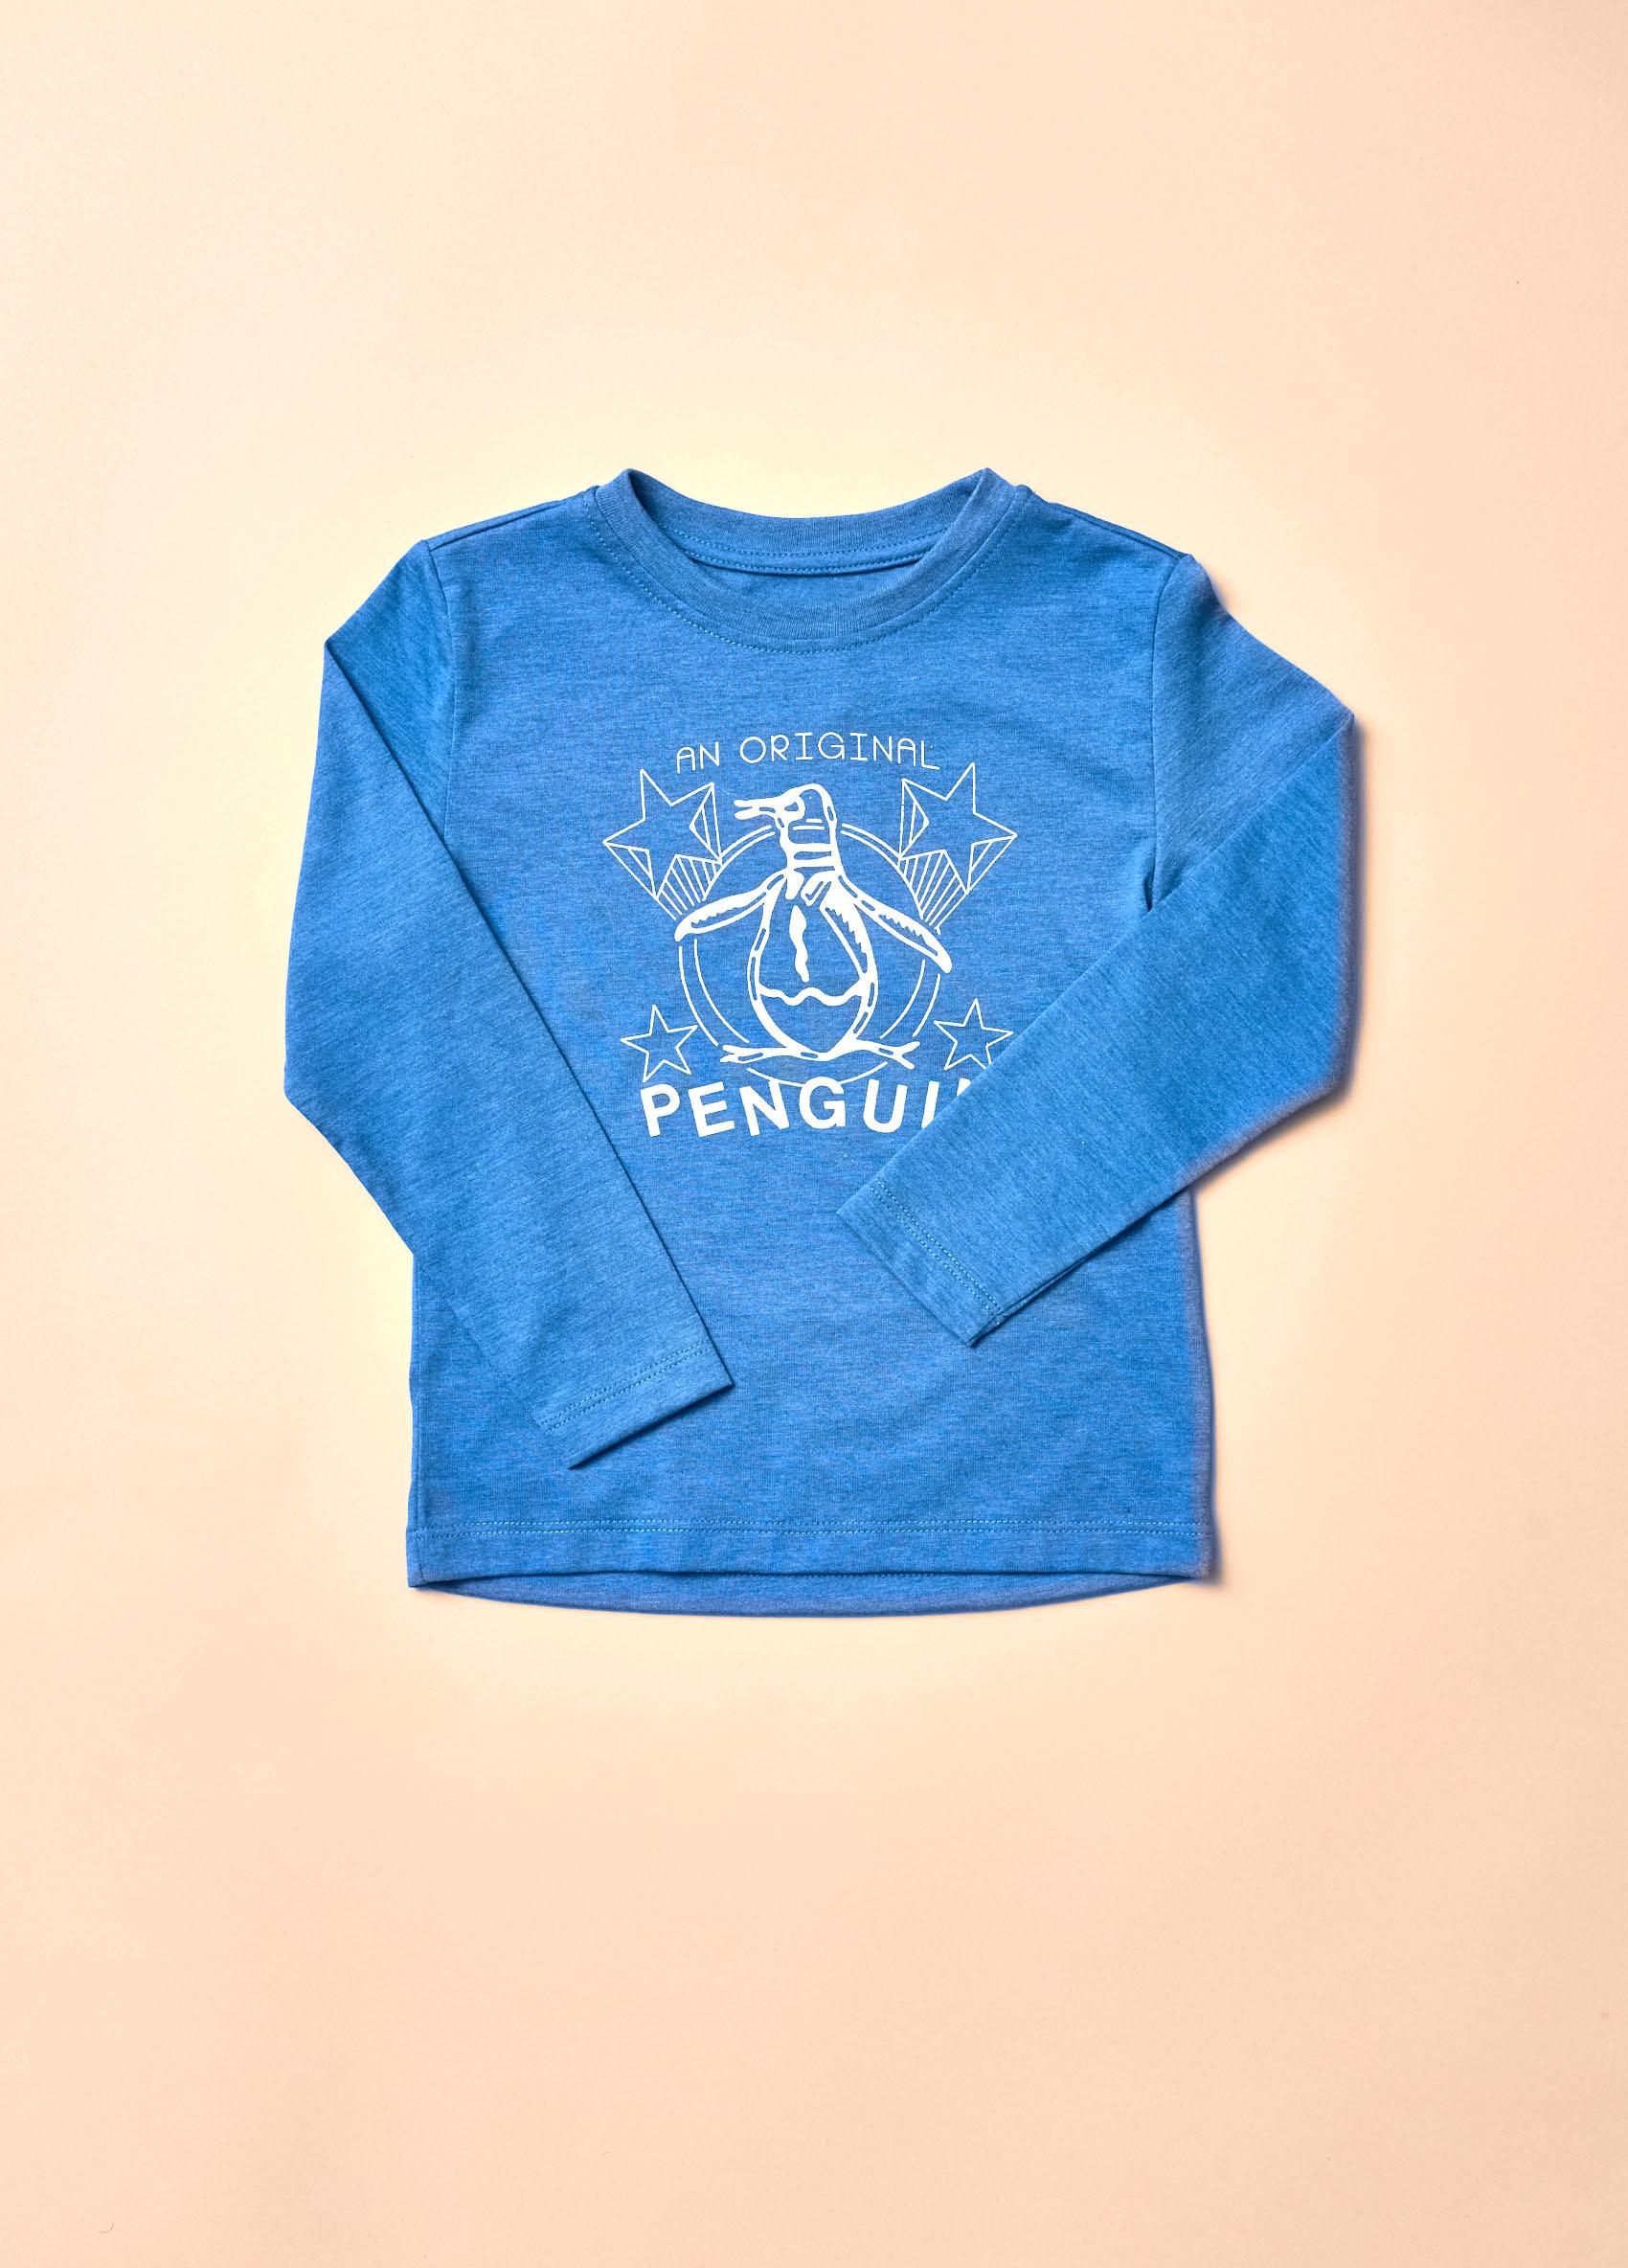 penguin_ls-poster-pete_21-08-2020__picture-10032